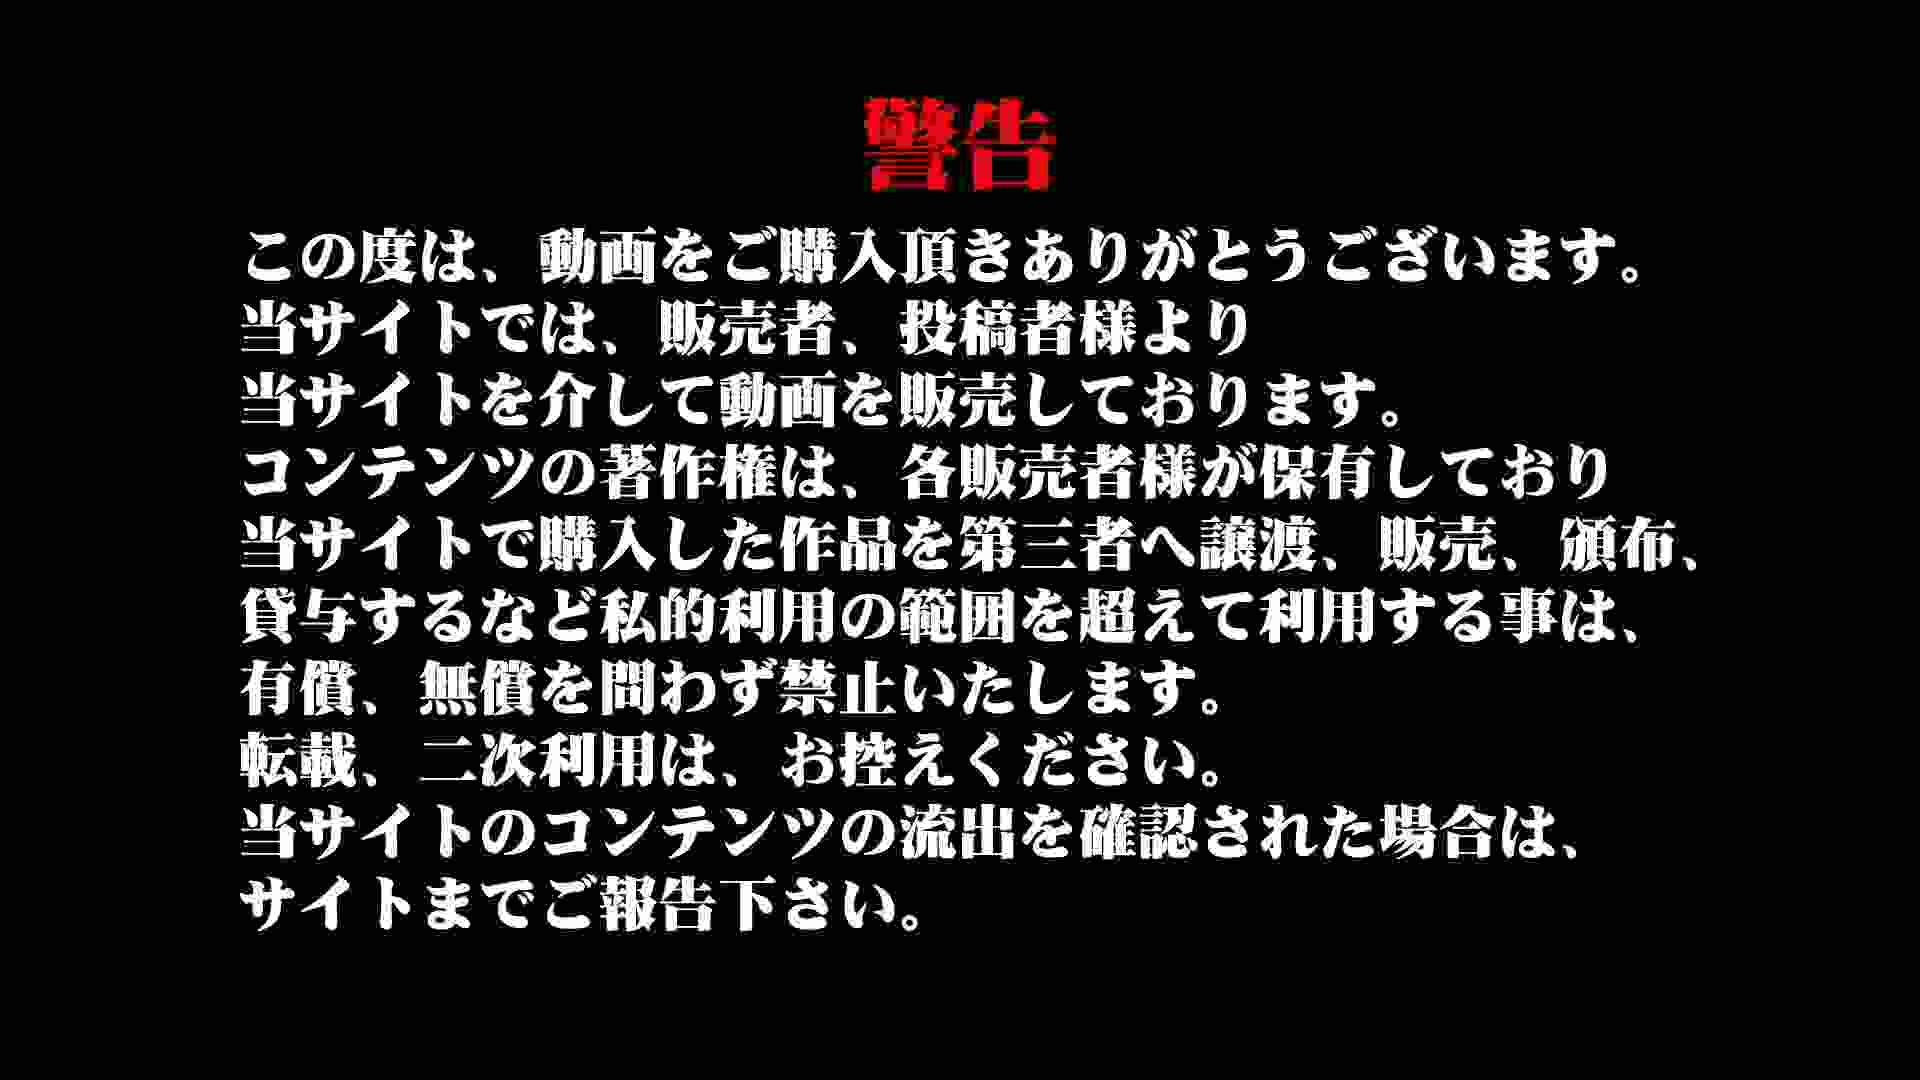 Aquaな露天風呂Vol.867潜入盗撮露天風呂参判湯 其の二 潜入突撃 セックス無修正動画無料 93pic 2